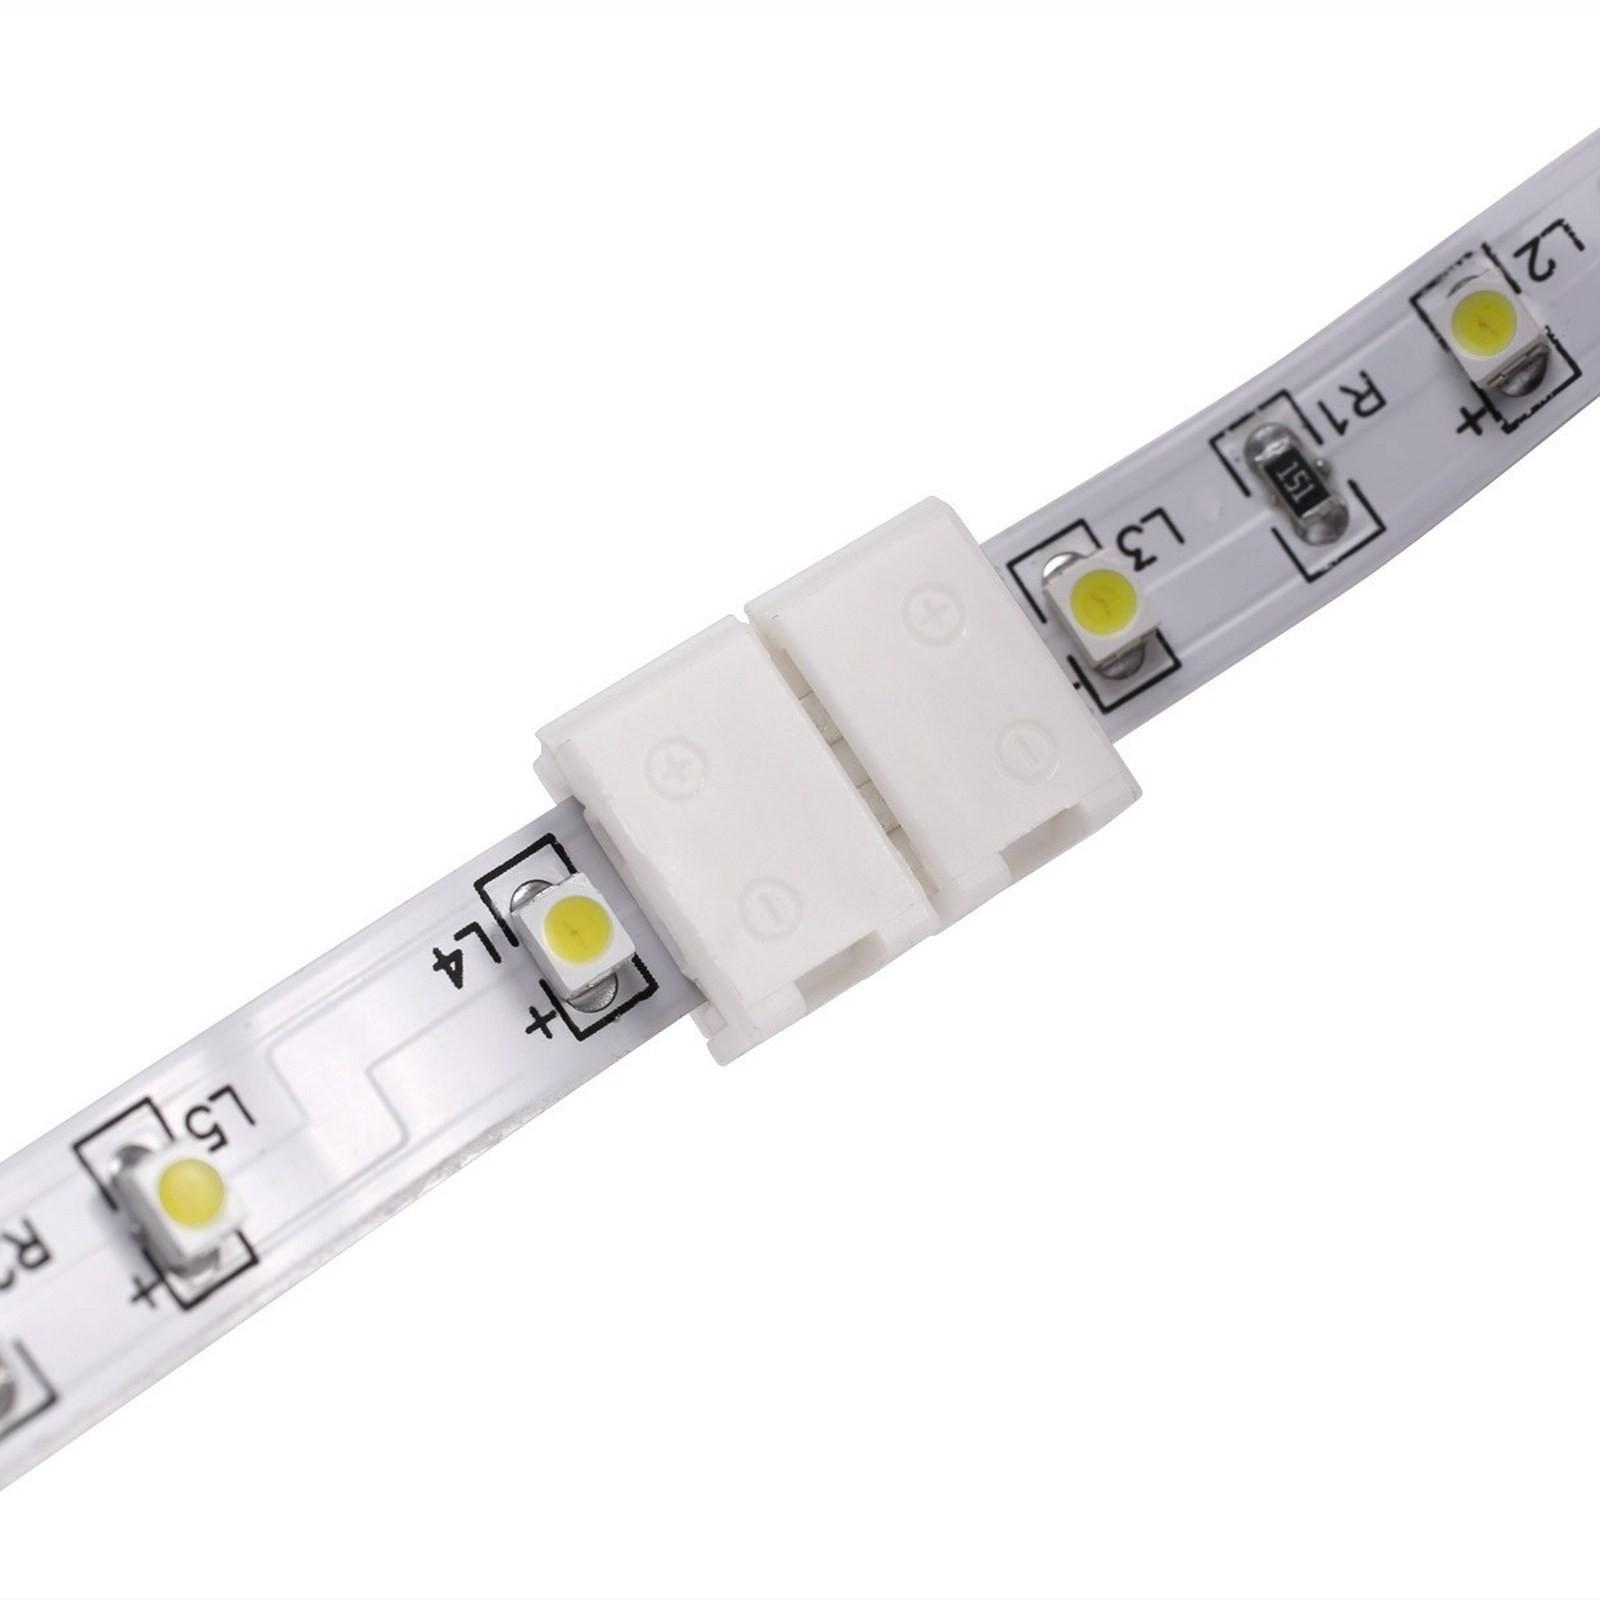 C10 3528 offerte cavi connettori e kit elettrici for Strisce led bricoman